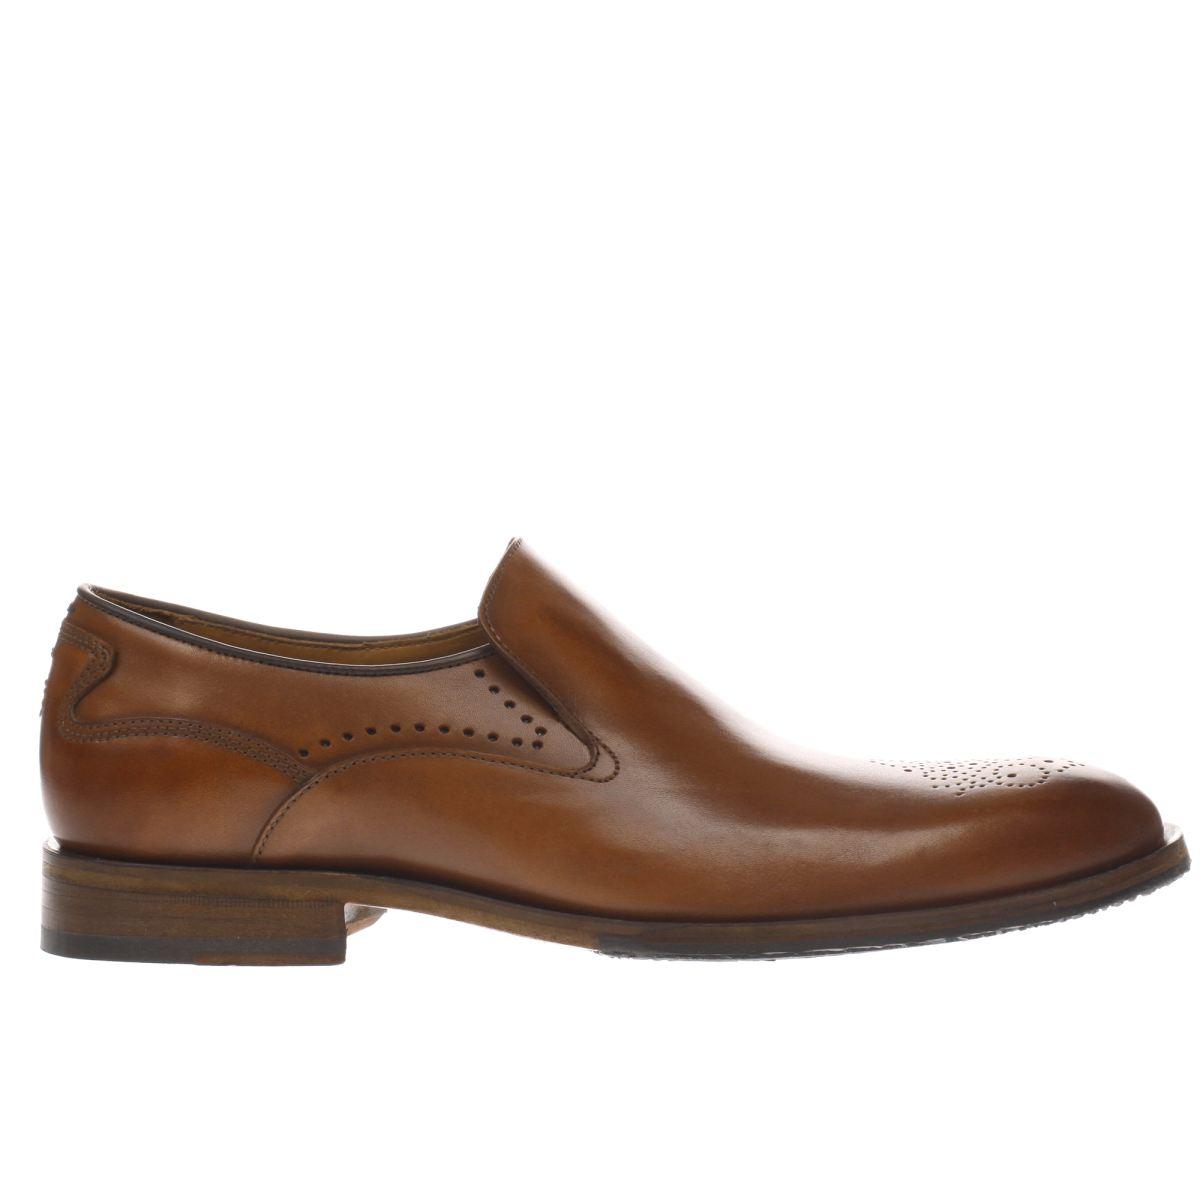 Oliver Sweeney Oliver Sweeney Tan Licata Shoes